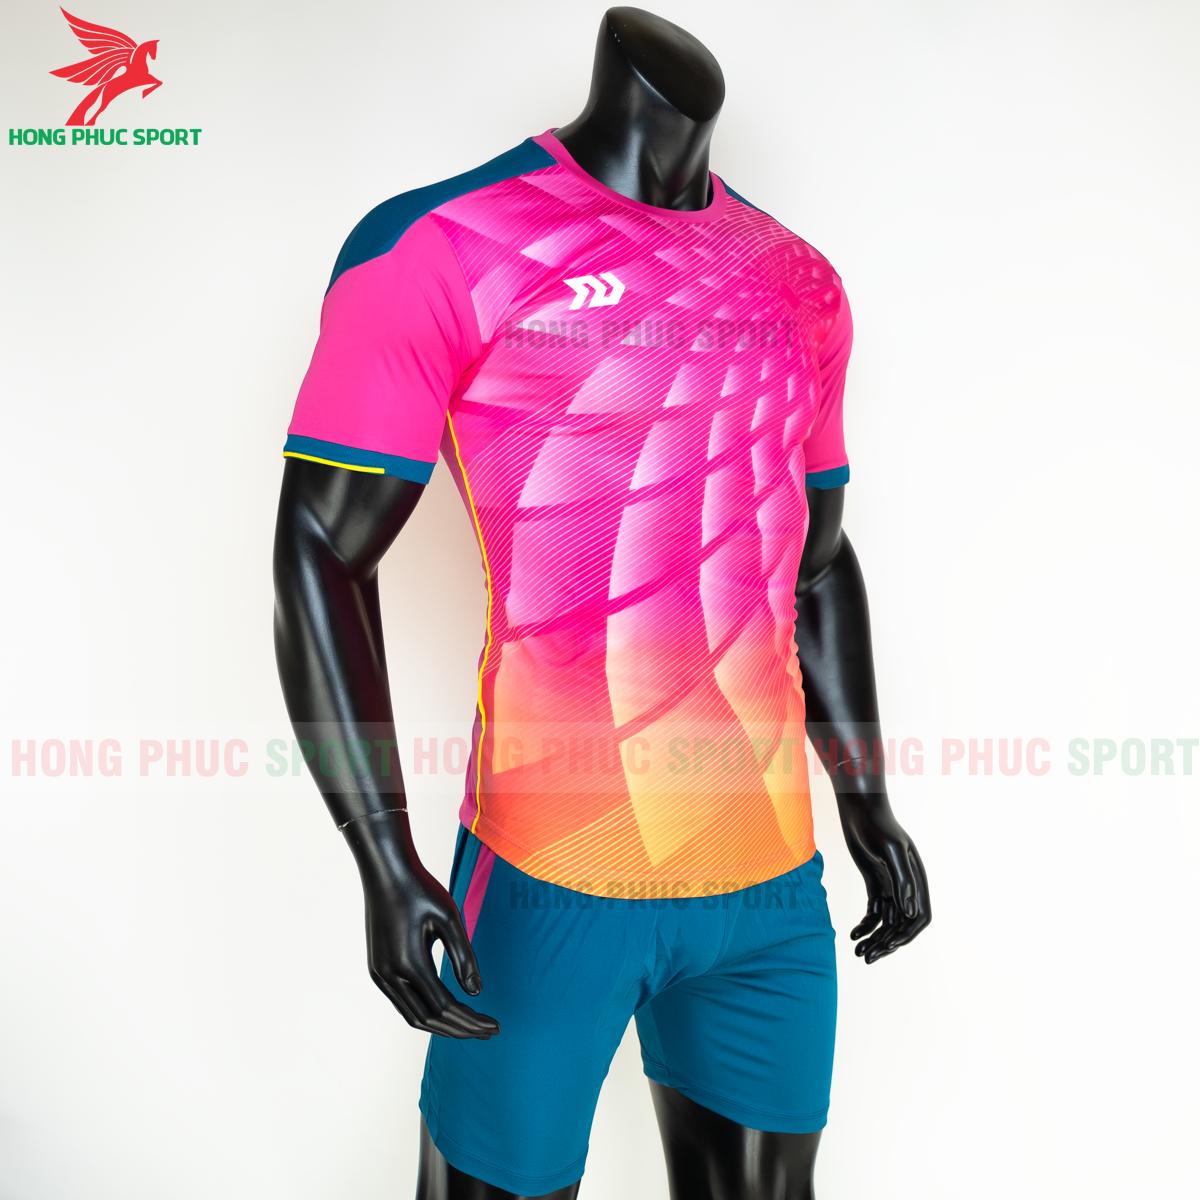 https://cdn.hongphucsport.com/unsafe/s4.shopbay.vn/files/285/ao-bong-da-khong-logo-bulbal-lotus-mau-hong-6-604f39974ae93.png